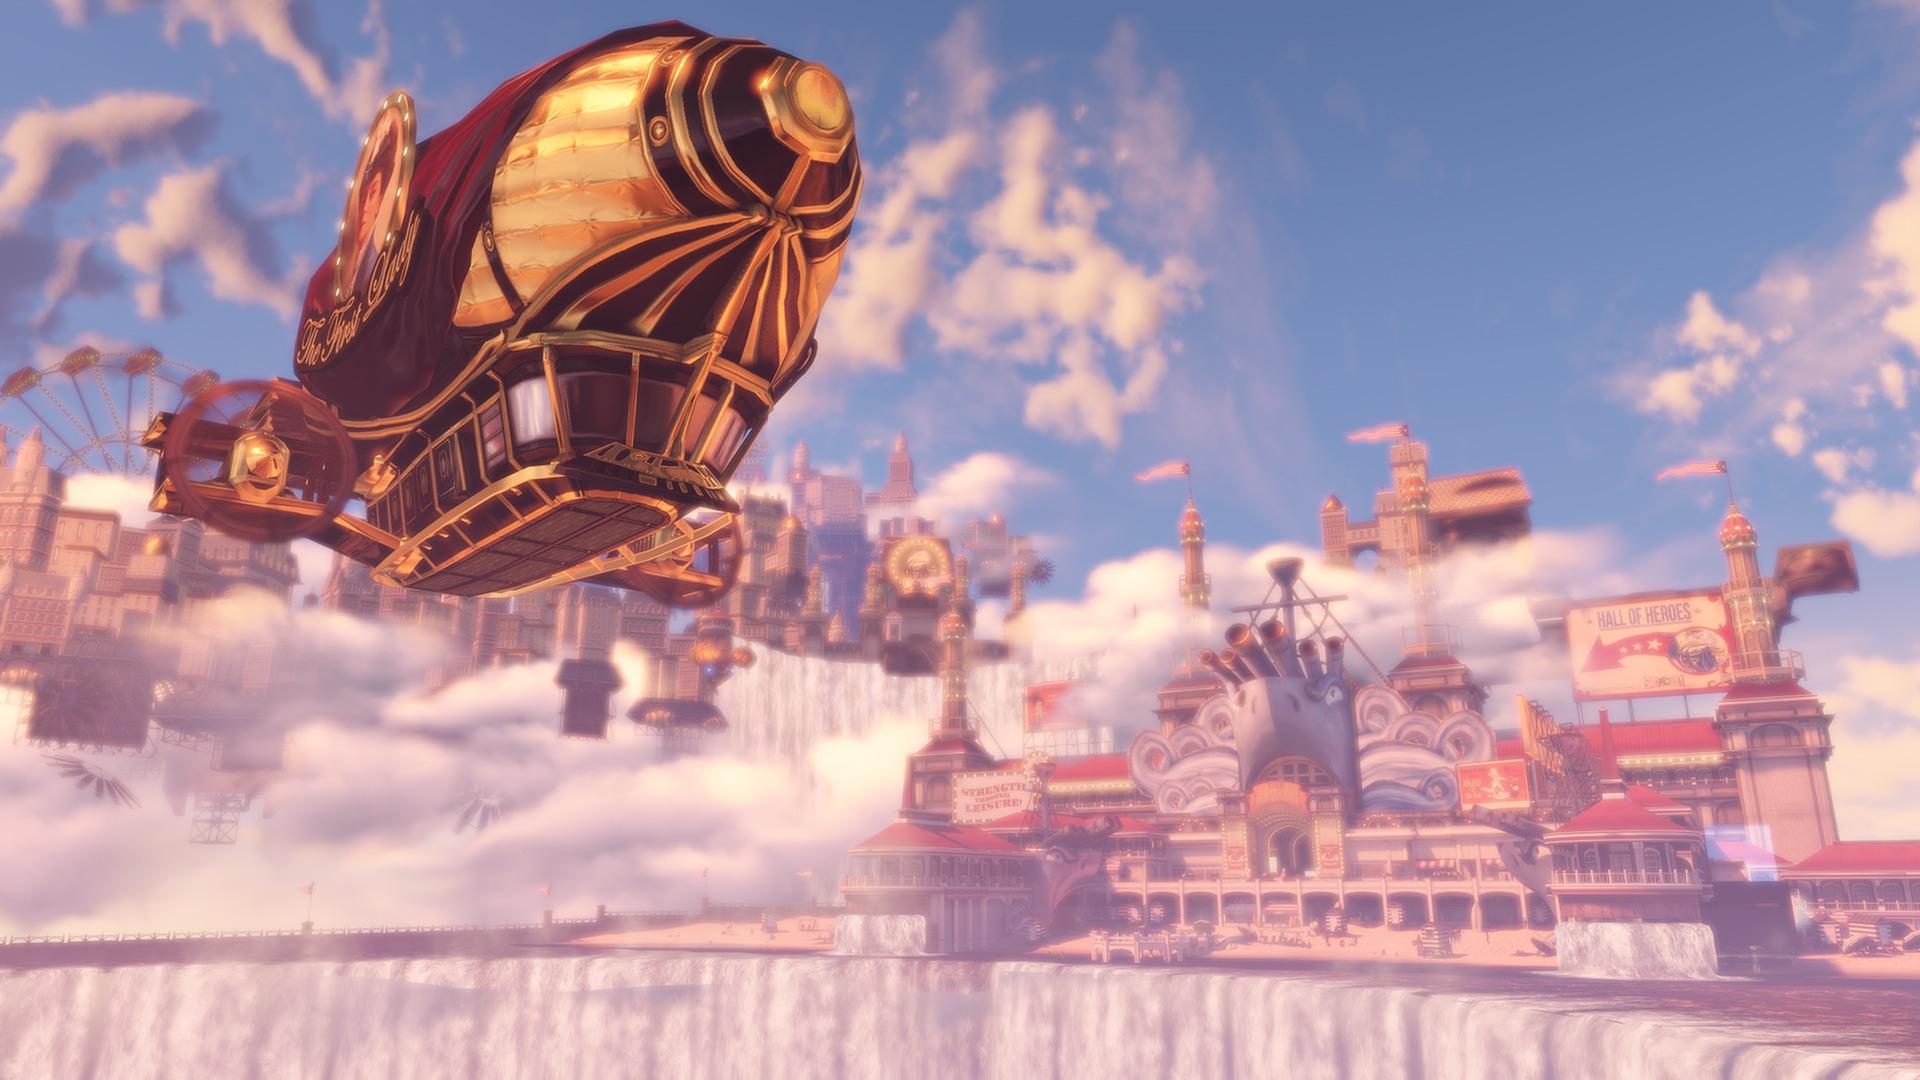 E3 2012: Inside E3 - Wii U, Lollipops and Aliens, oh my! [UPDATED